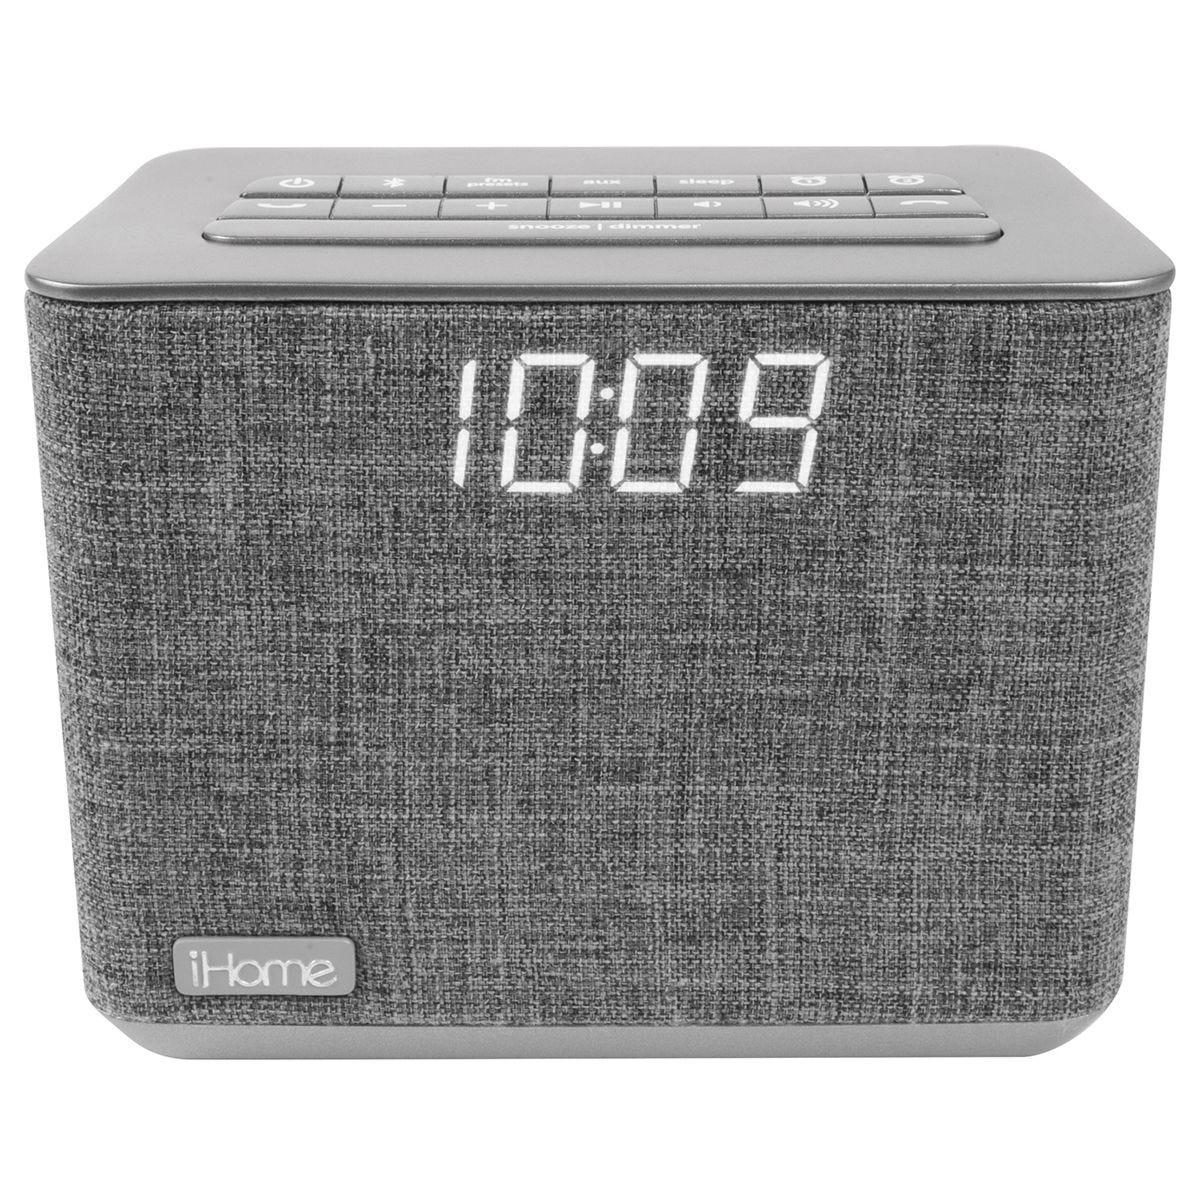 iHome Bluetooth FM Clock Radio with USB Charging - Grey